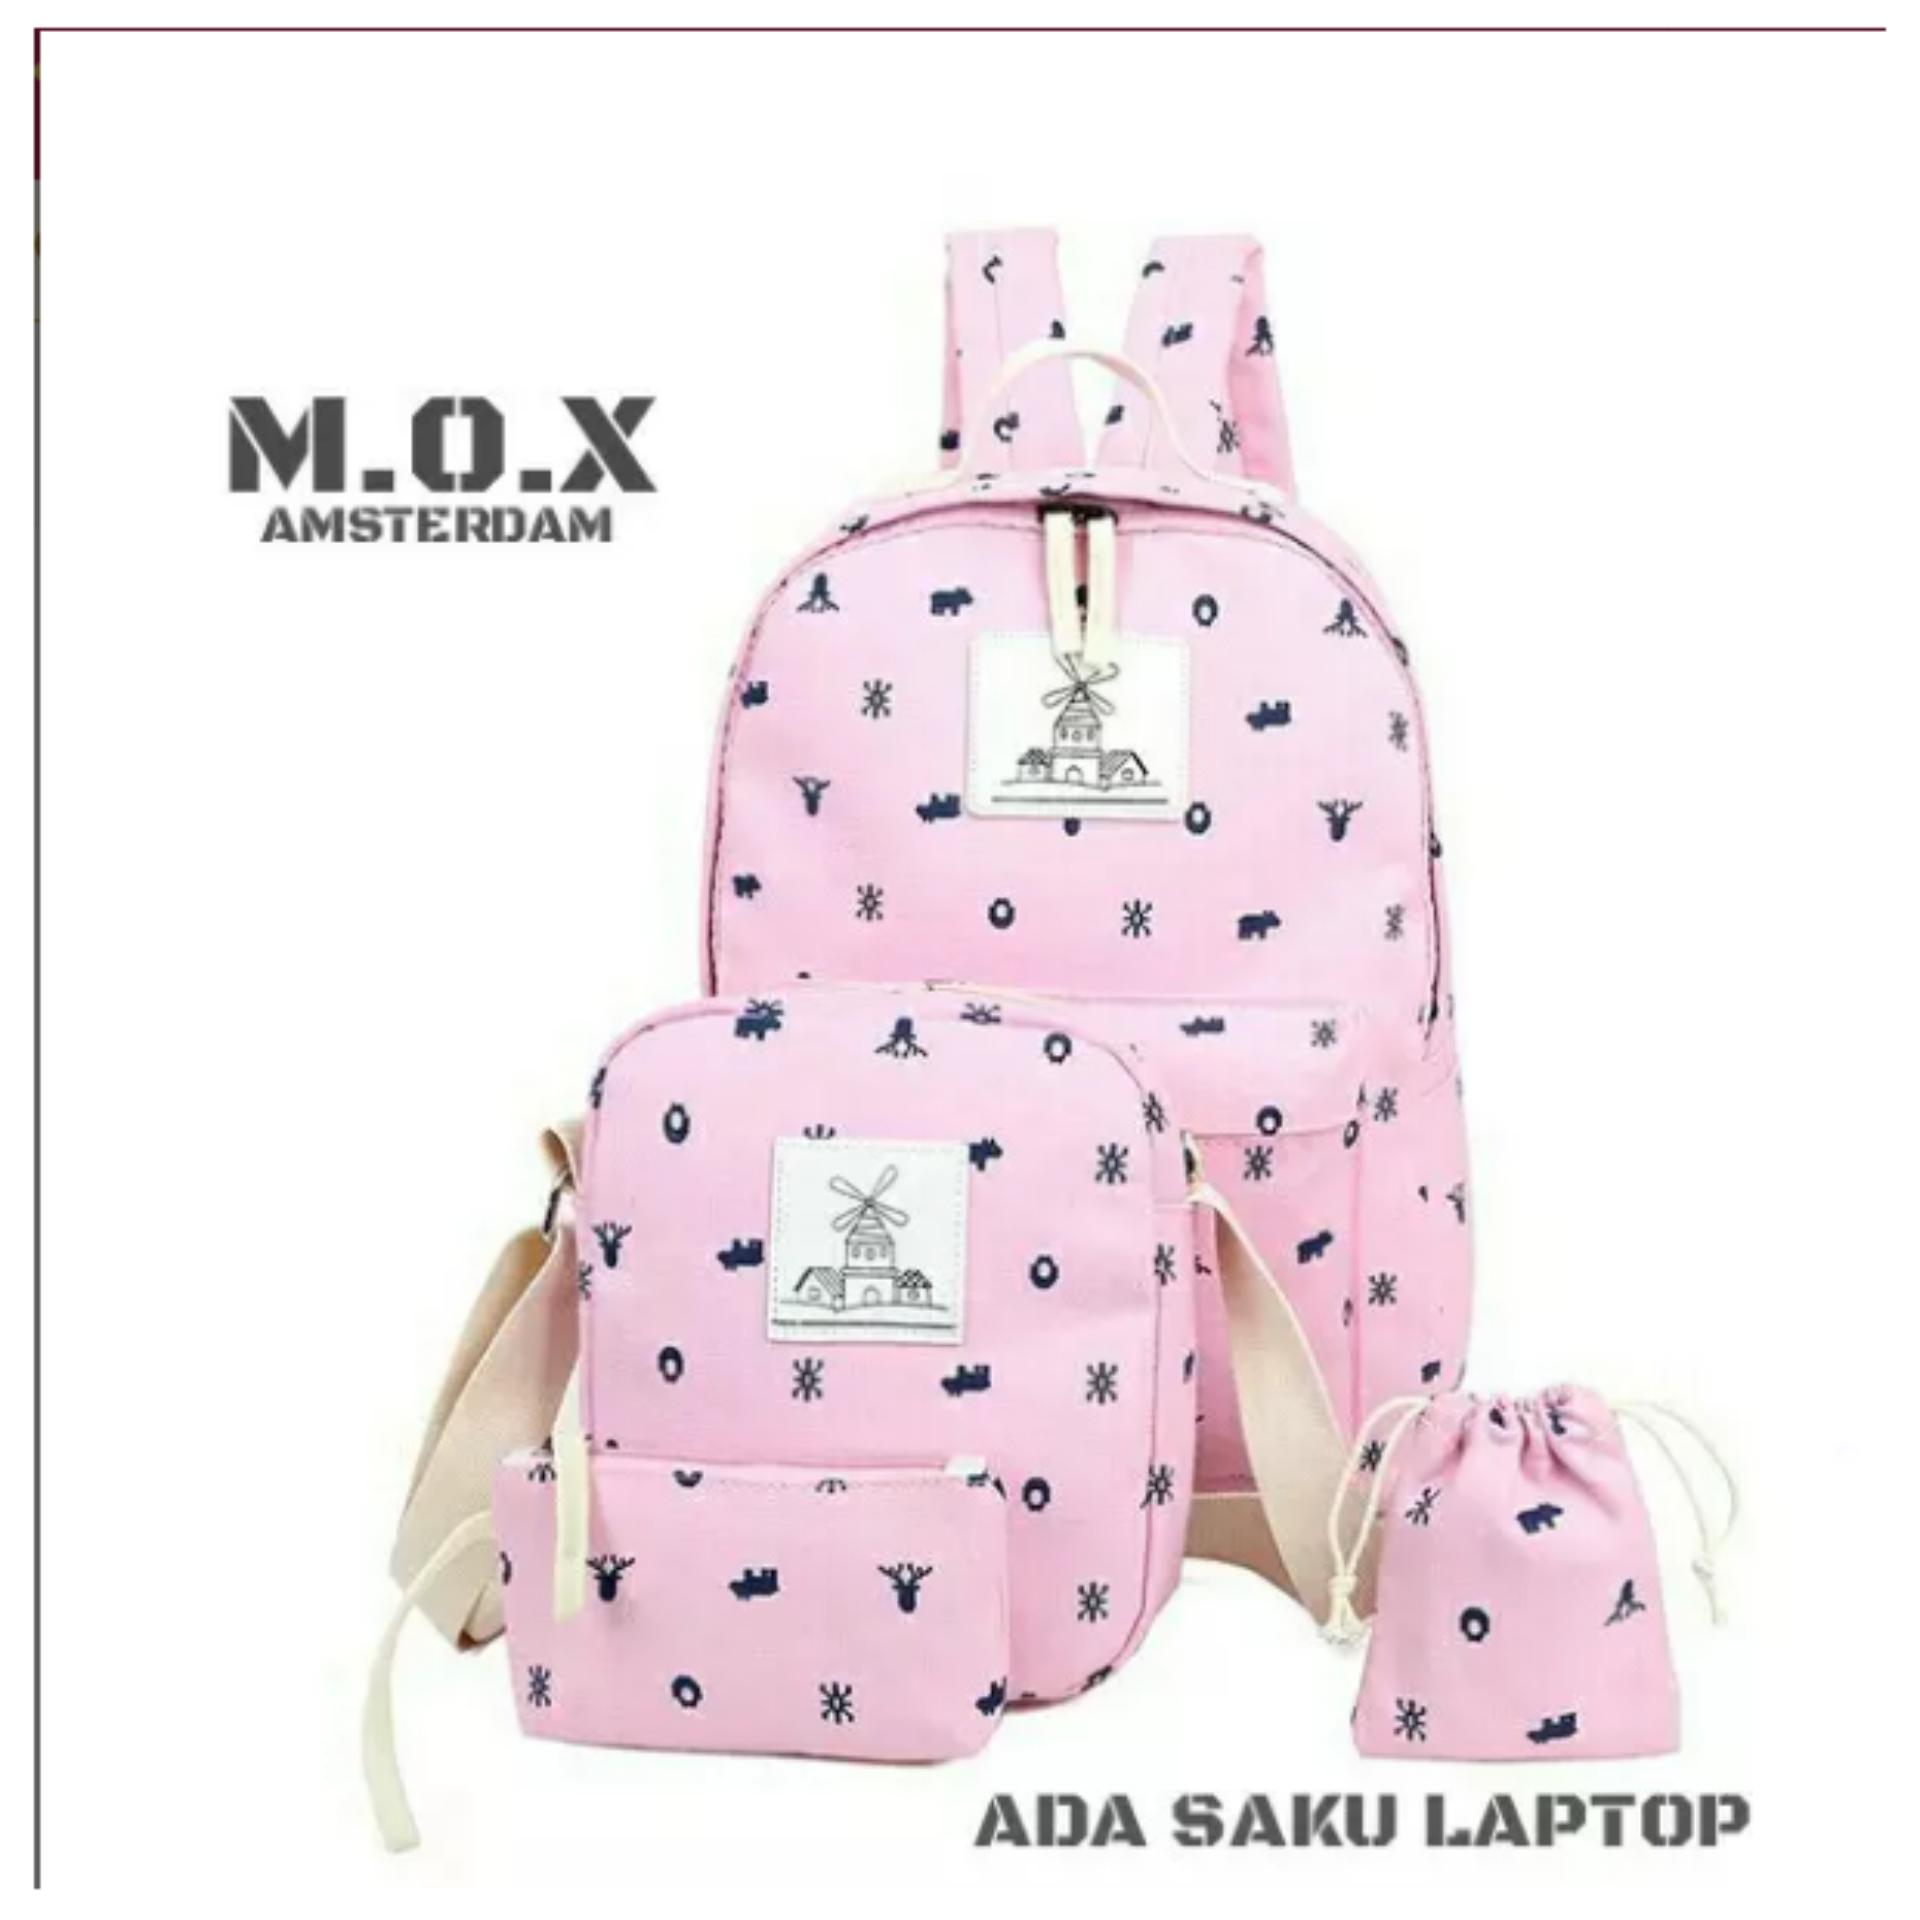 4 In 1 Amsterdam Bag / Tas Wanita / Unisex ( Ransel Backpack + Slempang + Dompet + Pouch HP )